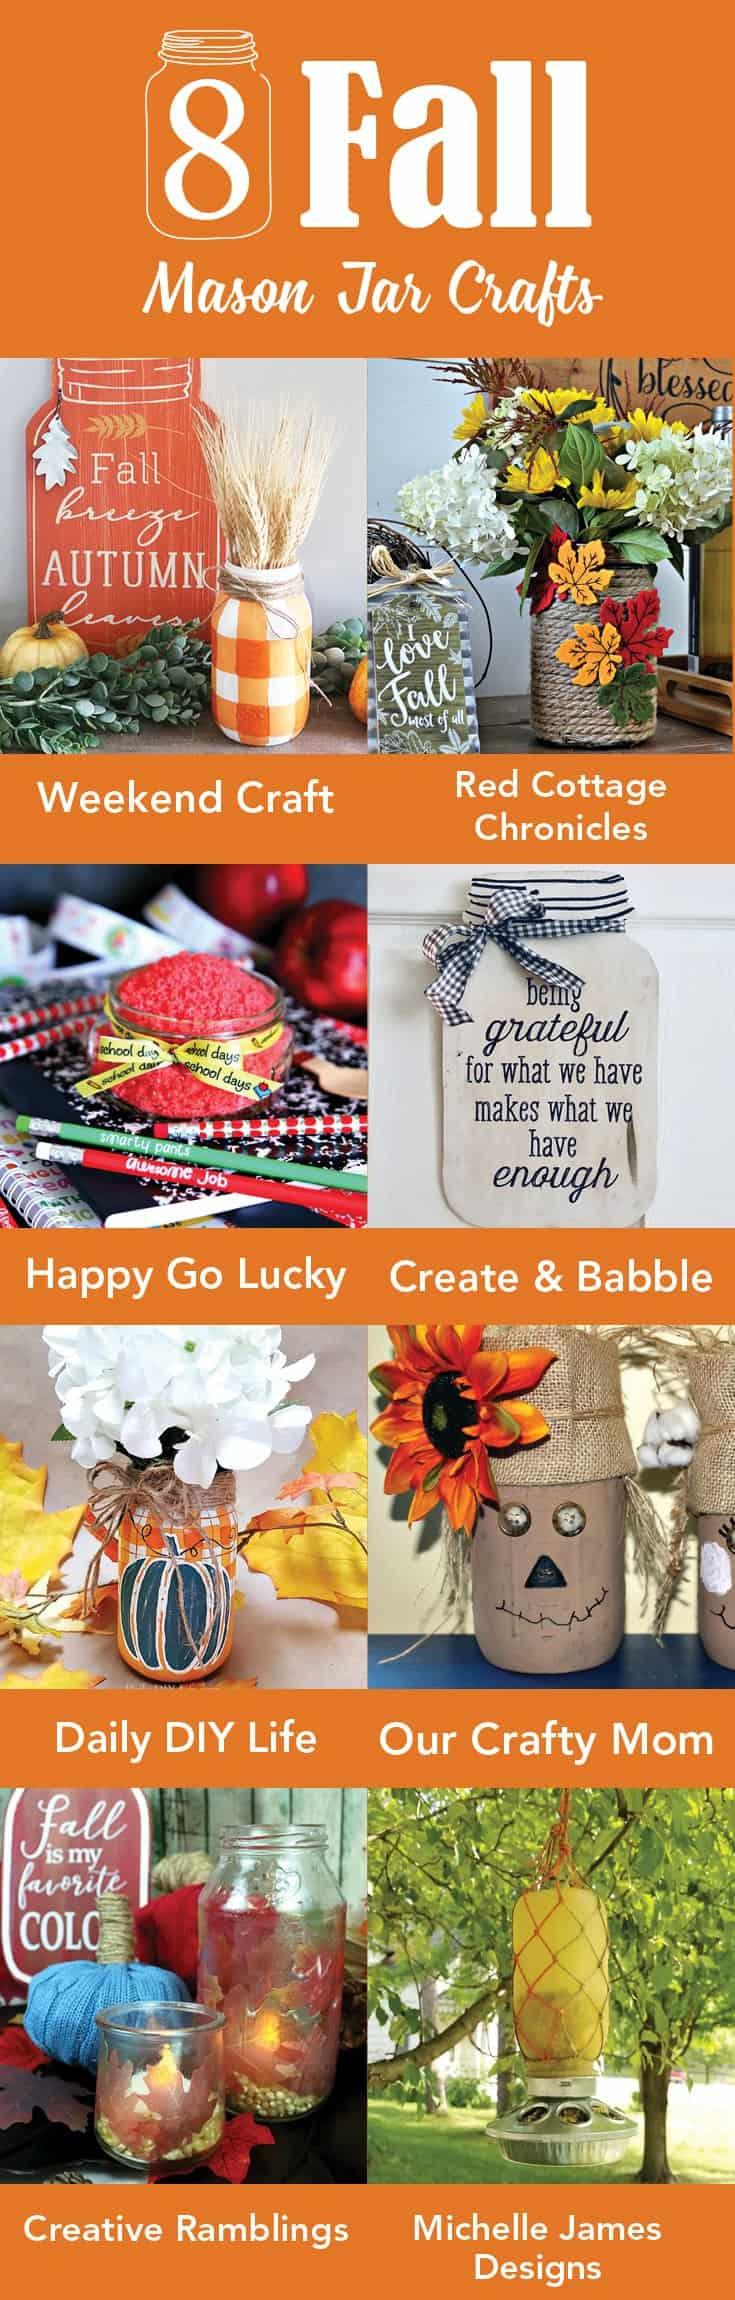 8 Fall Mason jar crafts